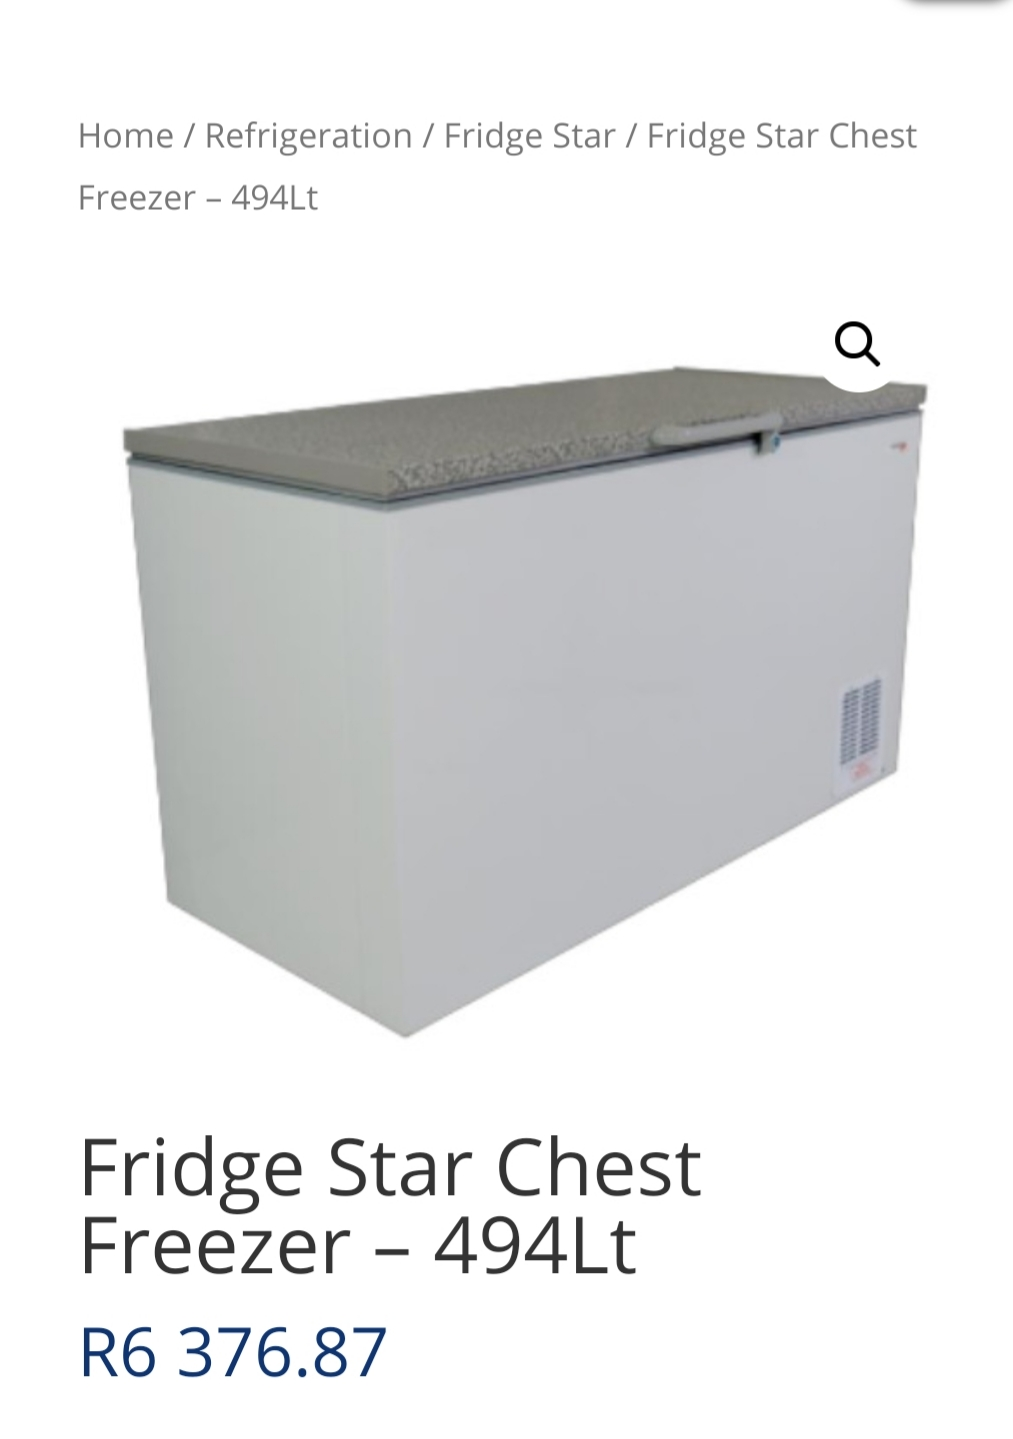 Used Fridge Star Chest Freezer 530L for sale.